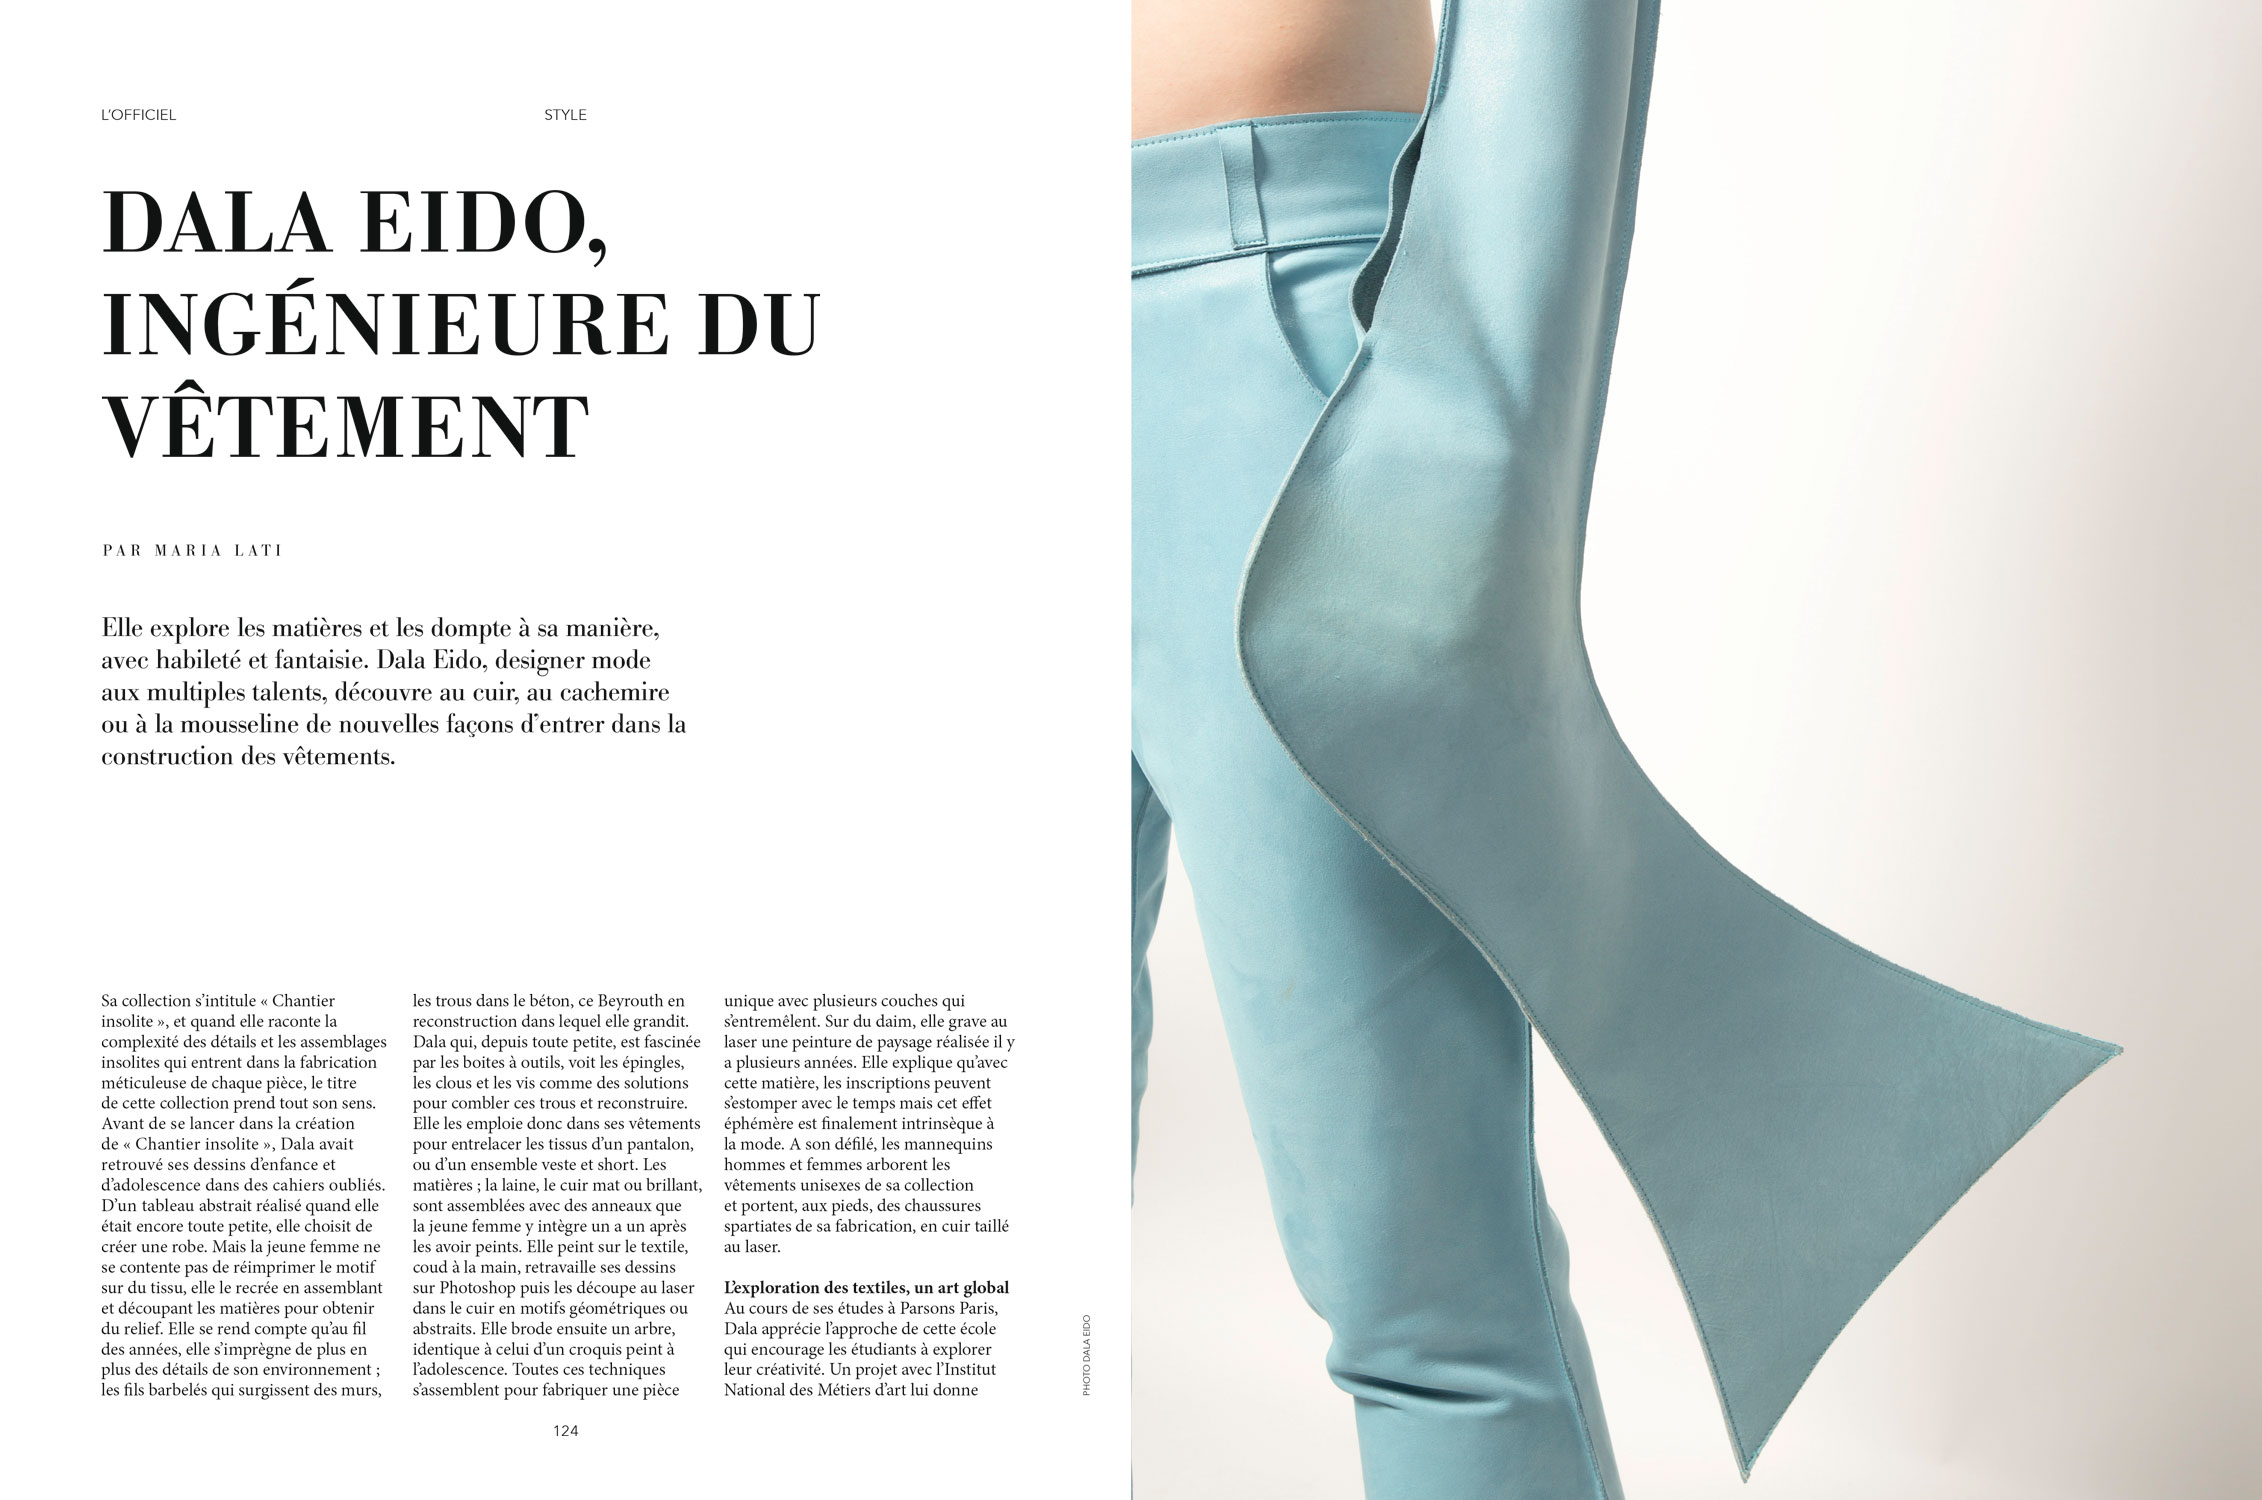 - L'Officiel-Levant, August/September - Issue 85